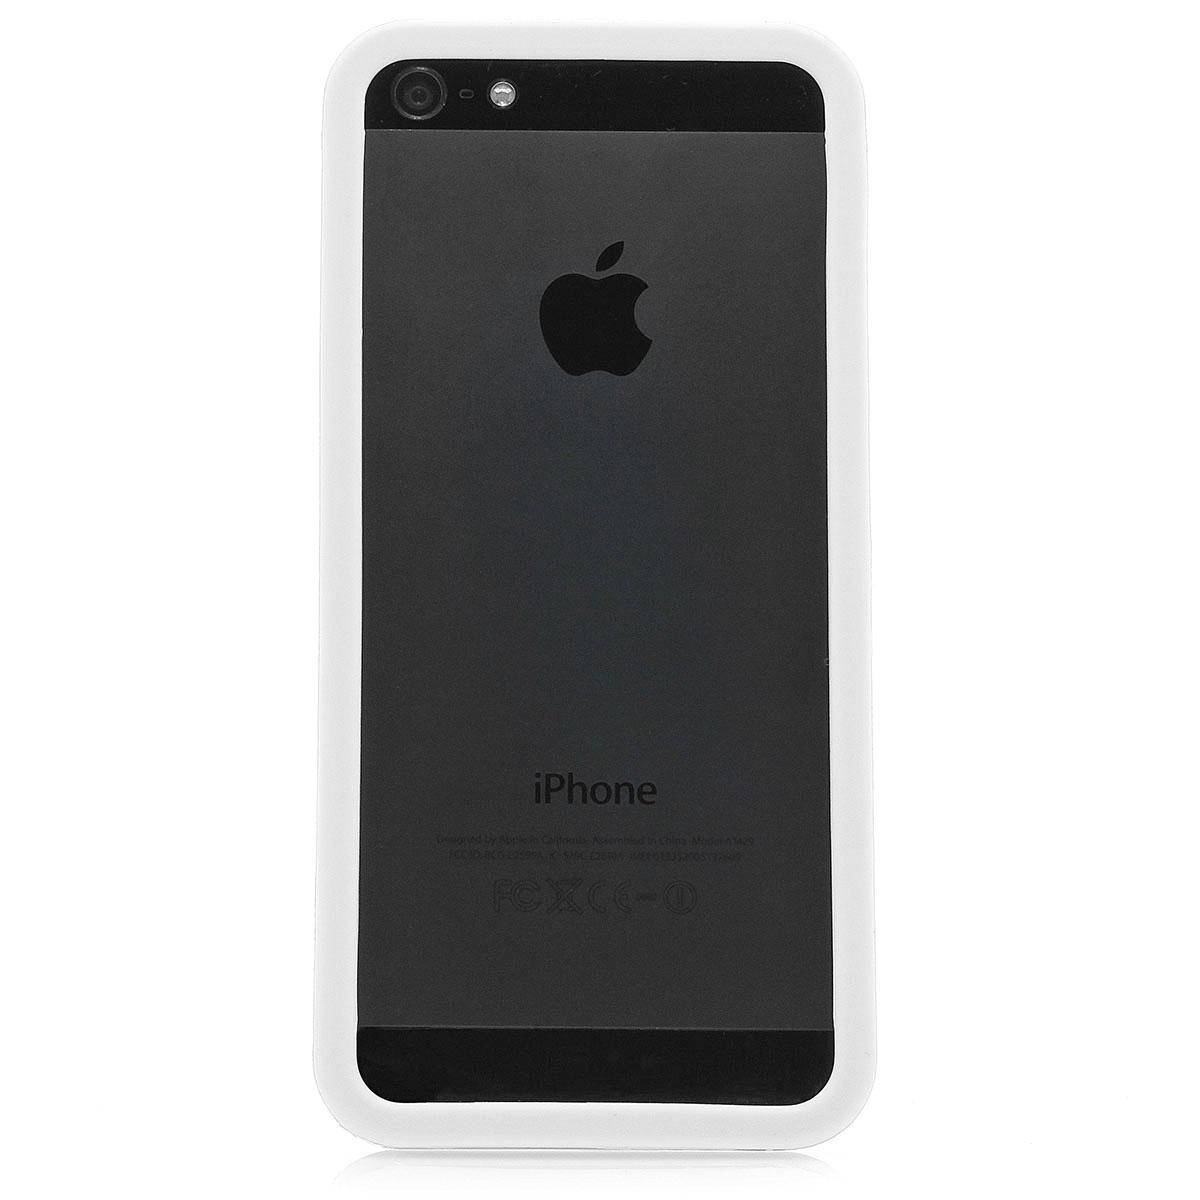 neu apple iphone 5 5s tpu bumper case silikon schutz. Black Bedroom Furniture Sets. Home Design Ideas